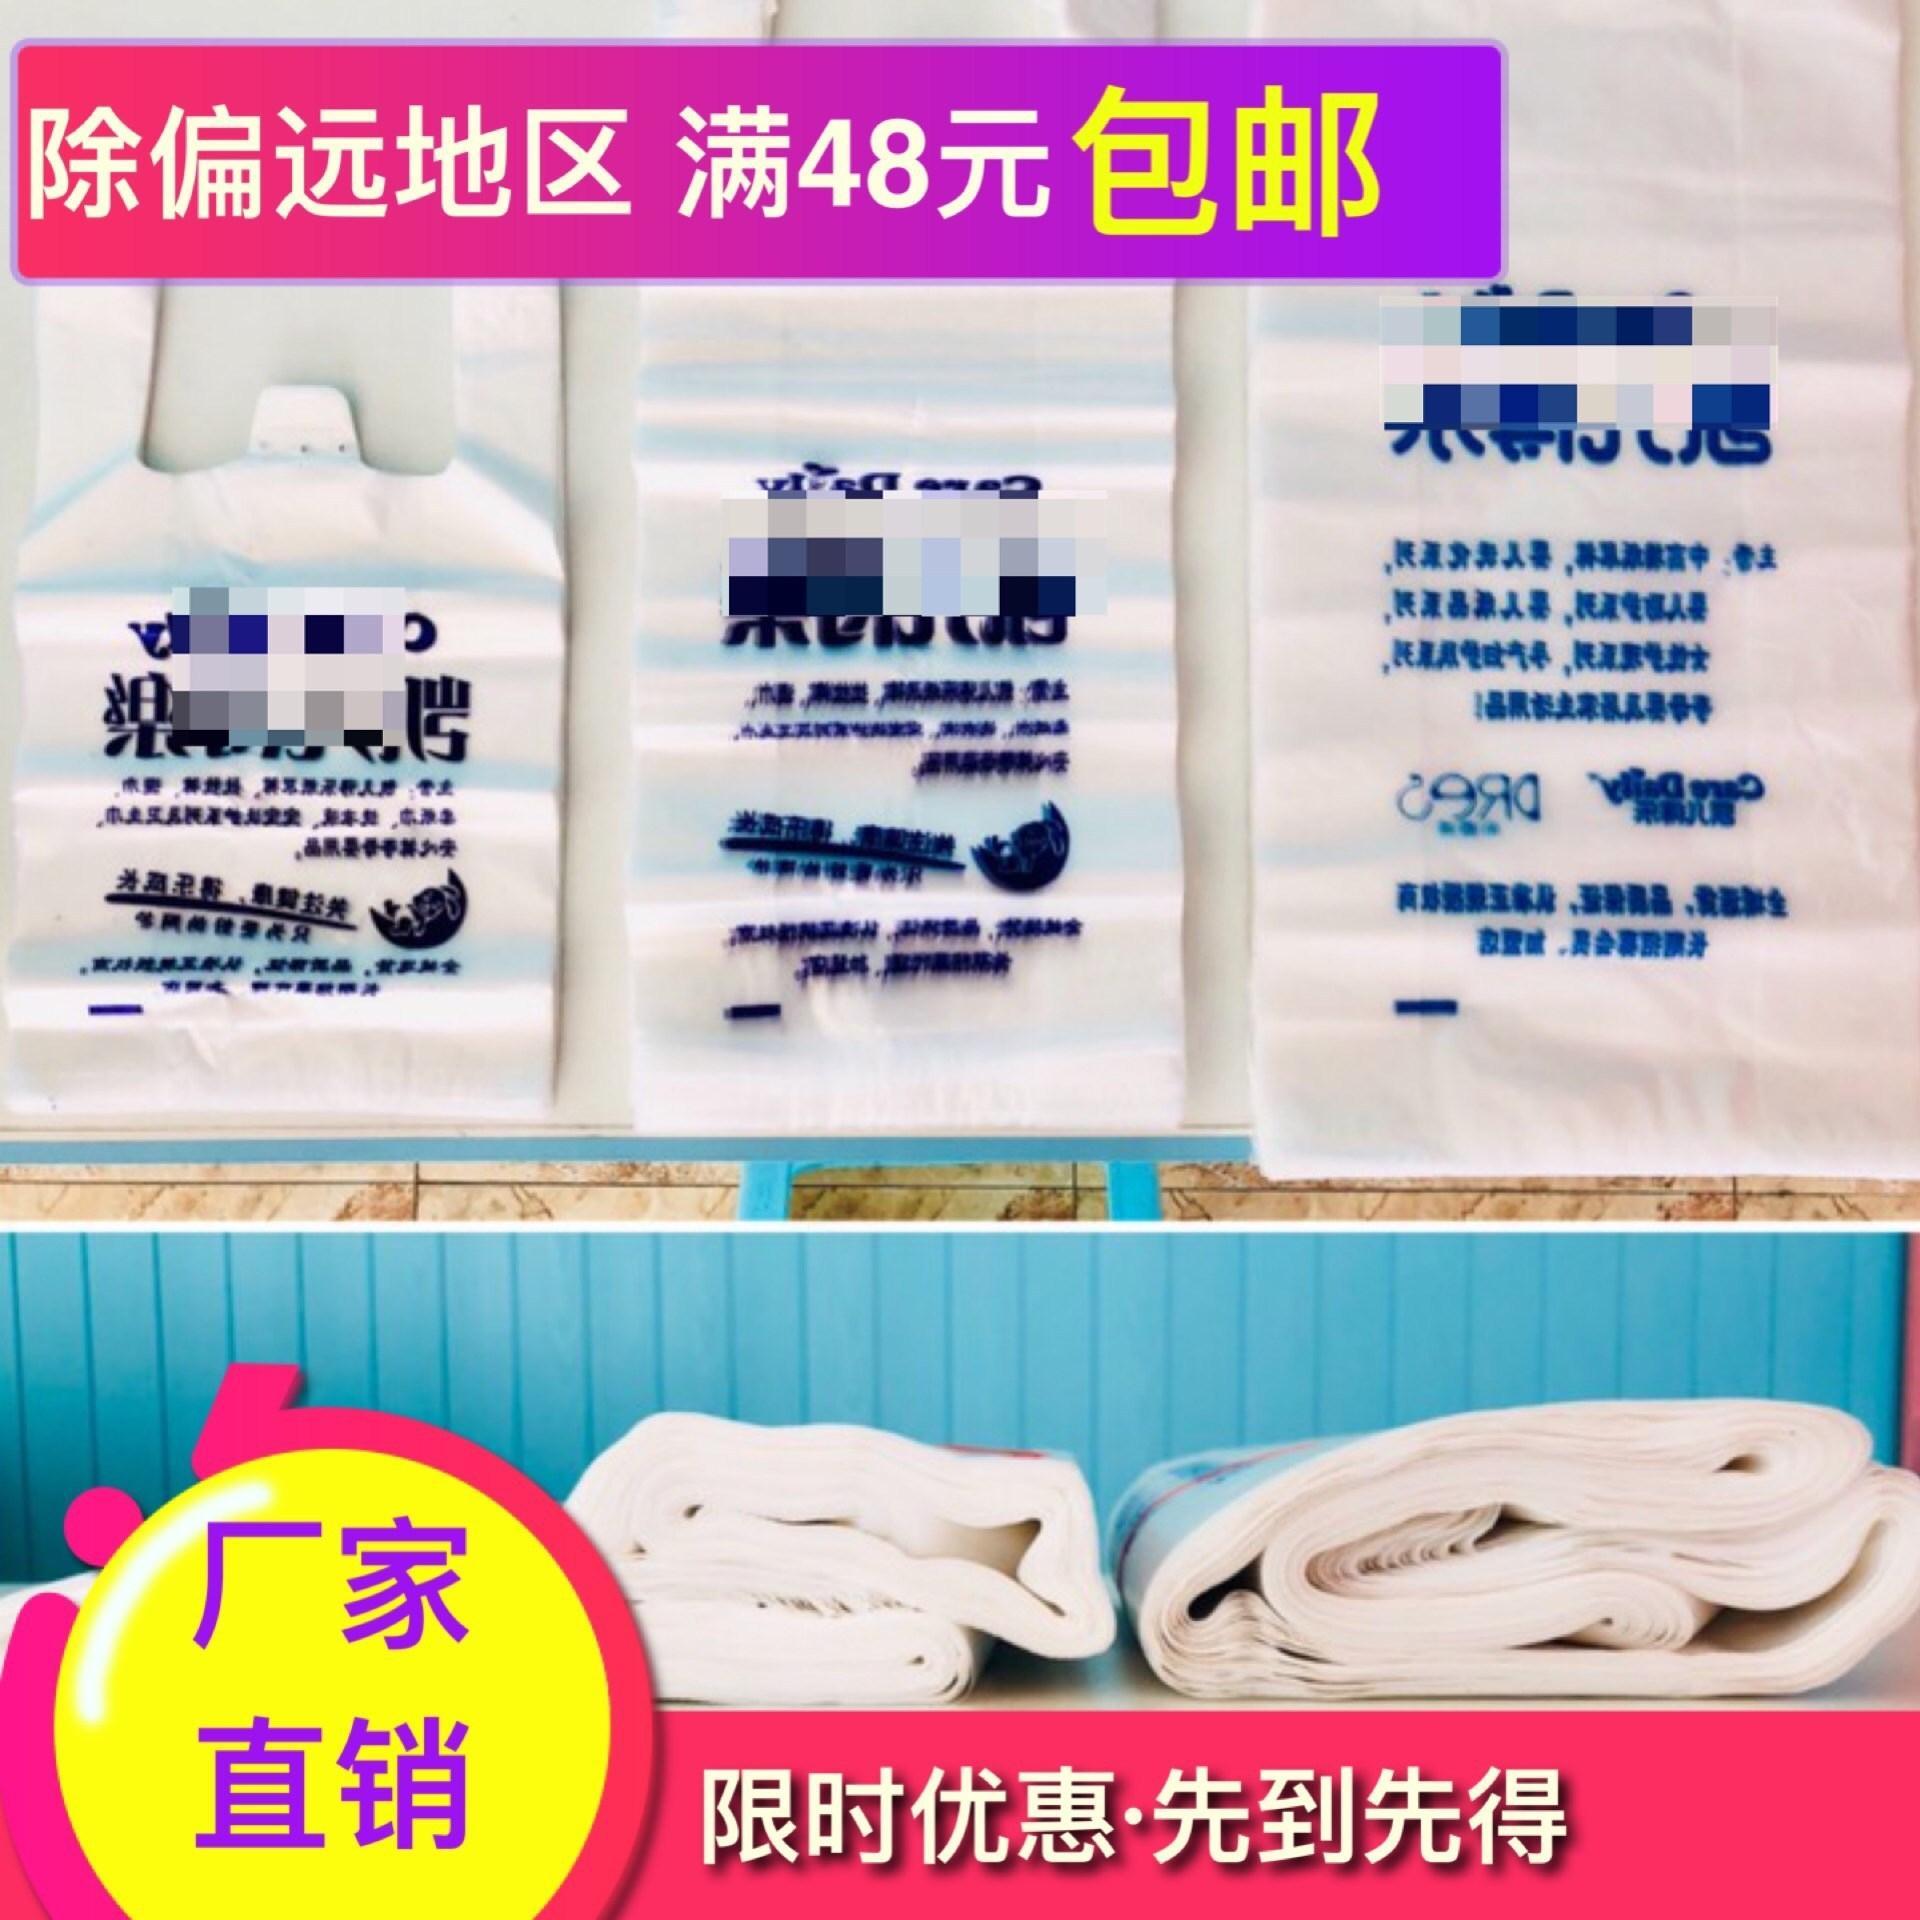 Hand bag, plastic bag, accessory bag, vest bag, over 48 yuan, except for remote